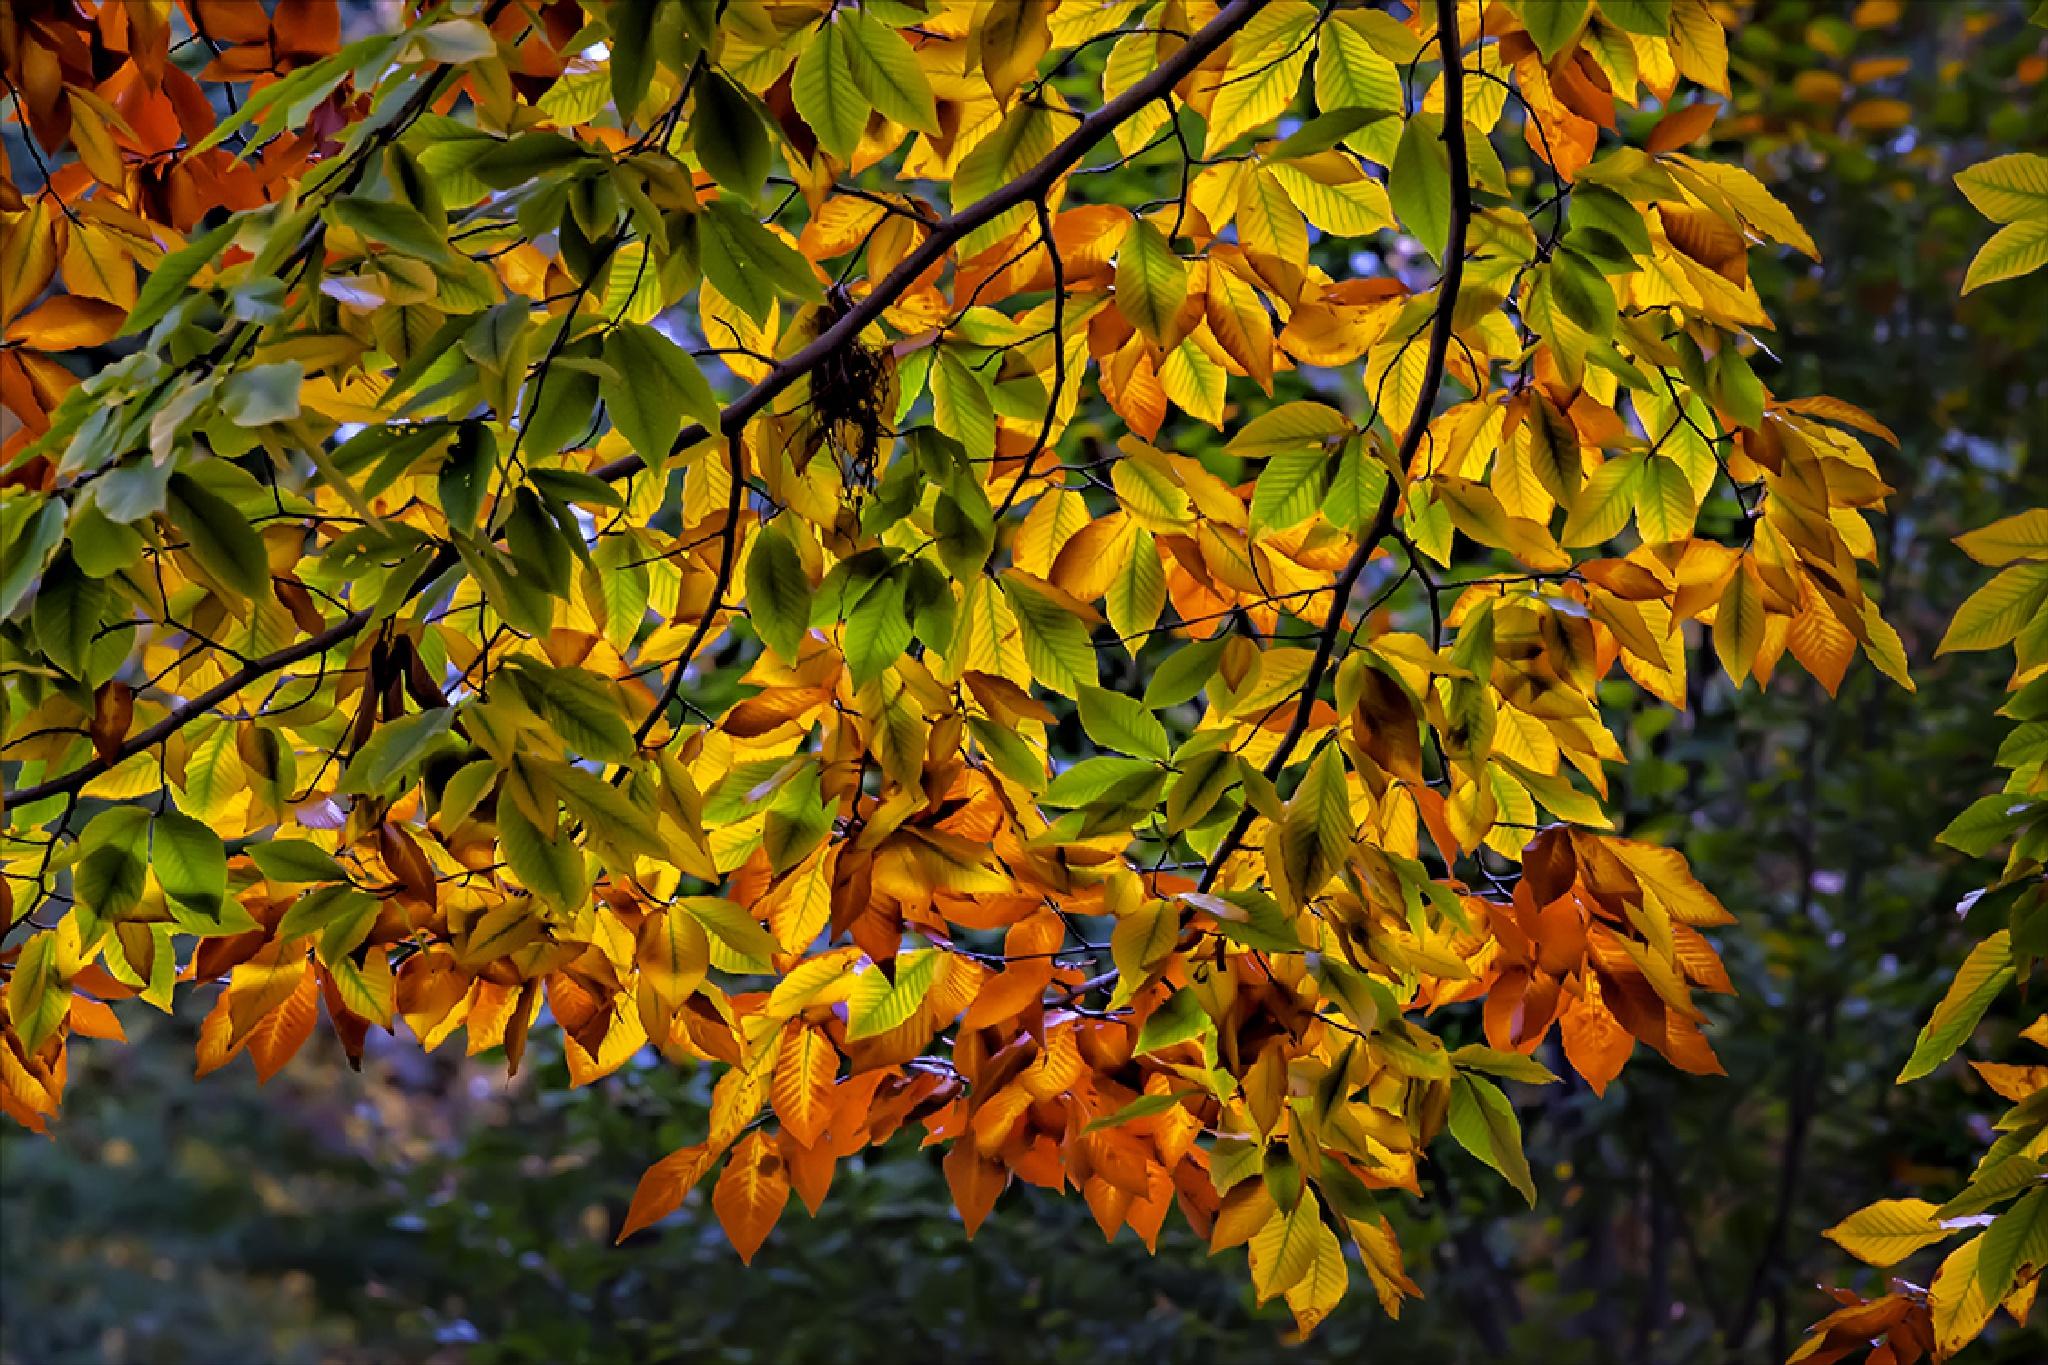 Fall Foliage by robertullmann